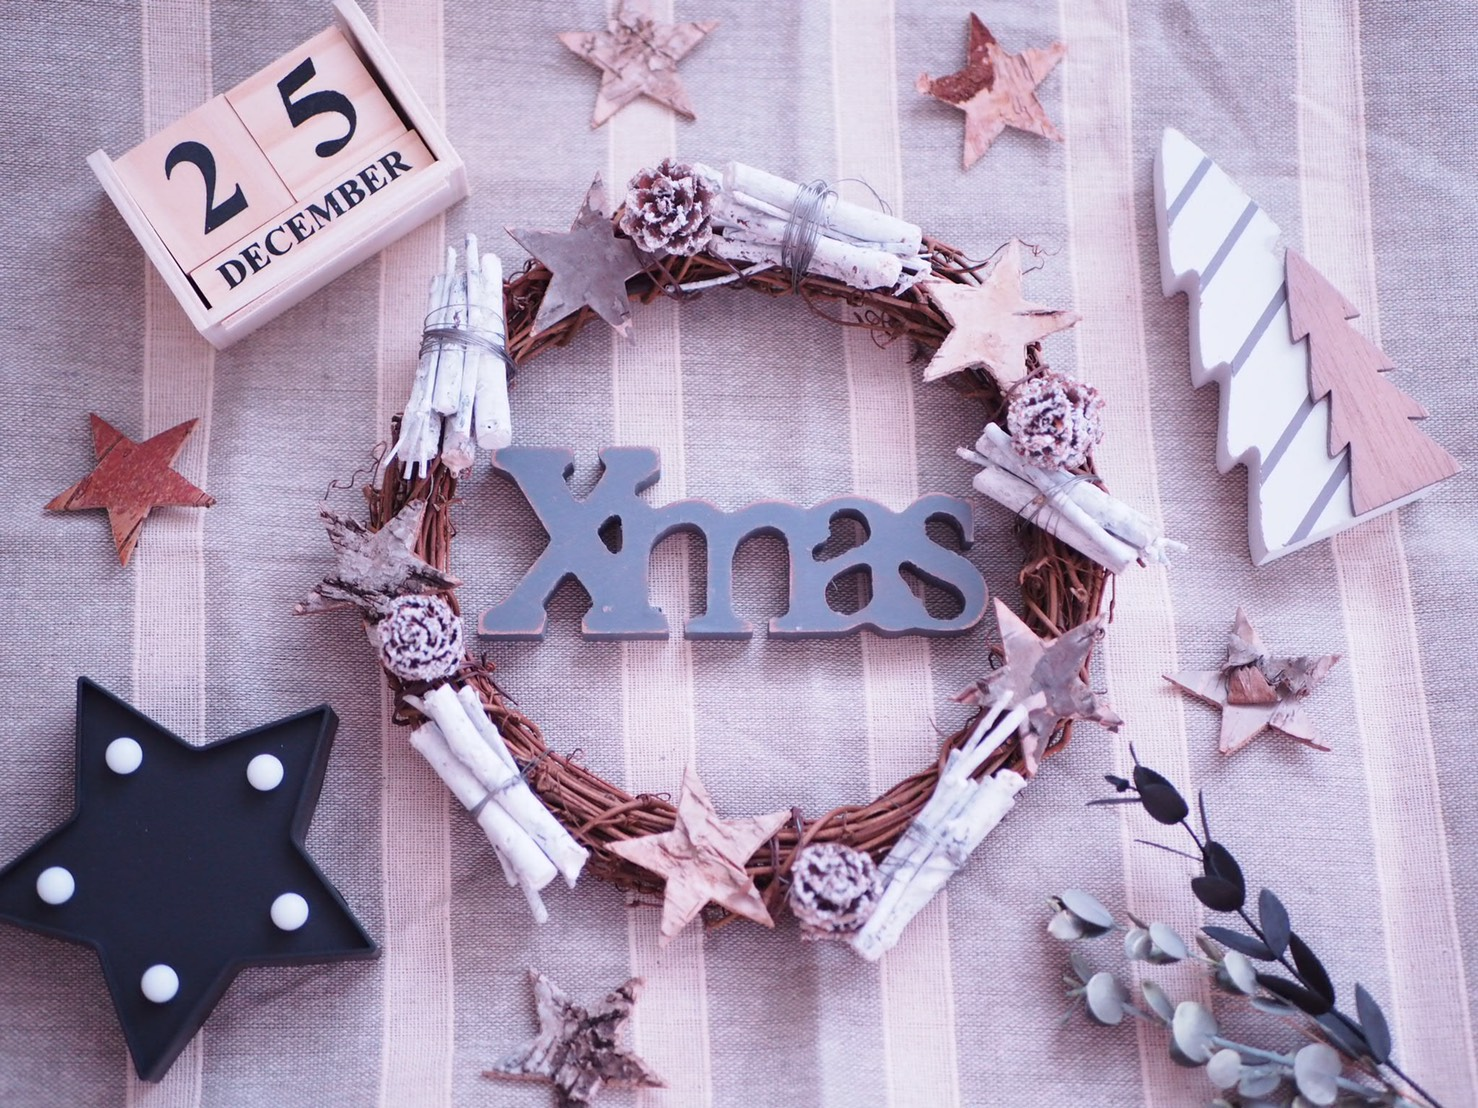 【#Seria】可愛すぎるセリアの新作itemでクリスマスムードを楽しむ♡_1